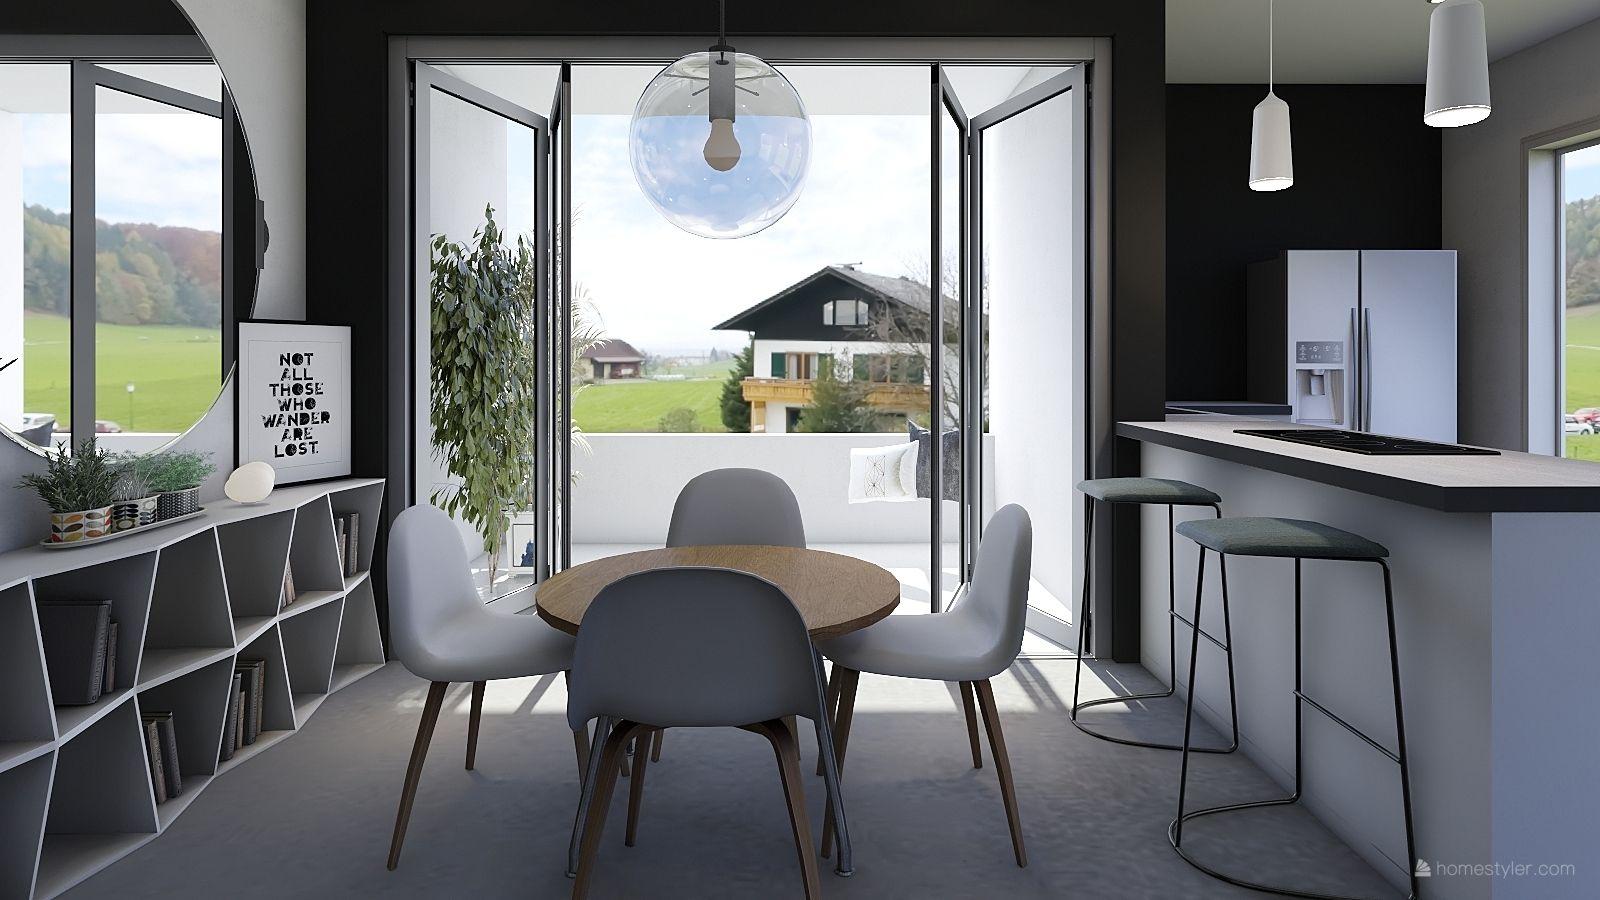 Dining Room Design By Nichole Van Staden Home Design Software